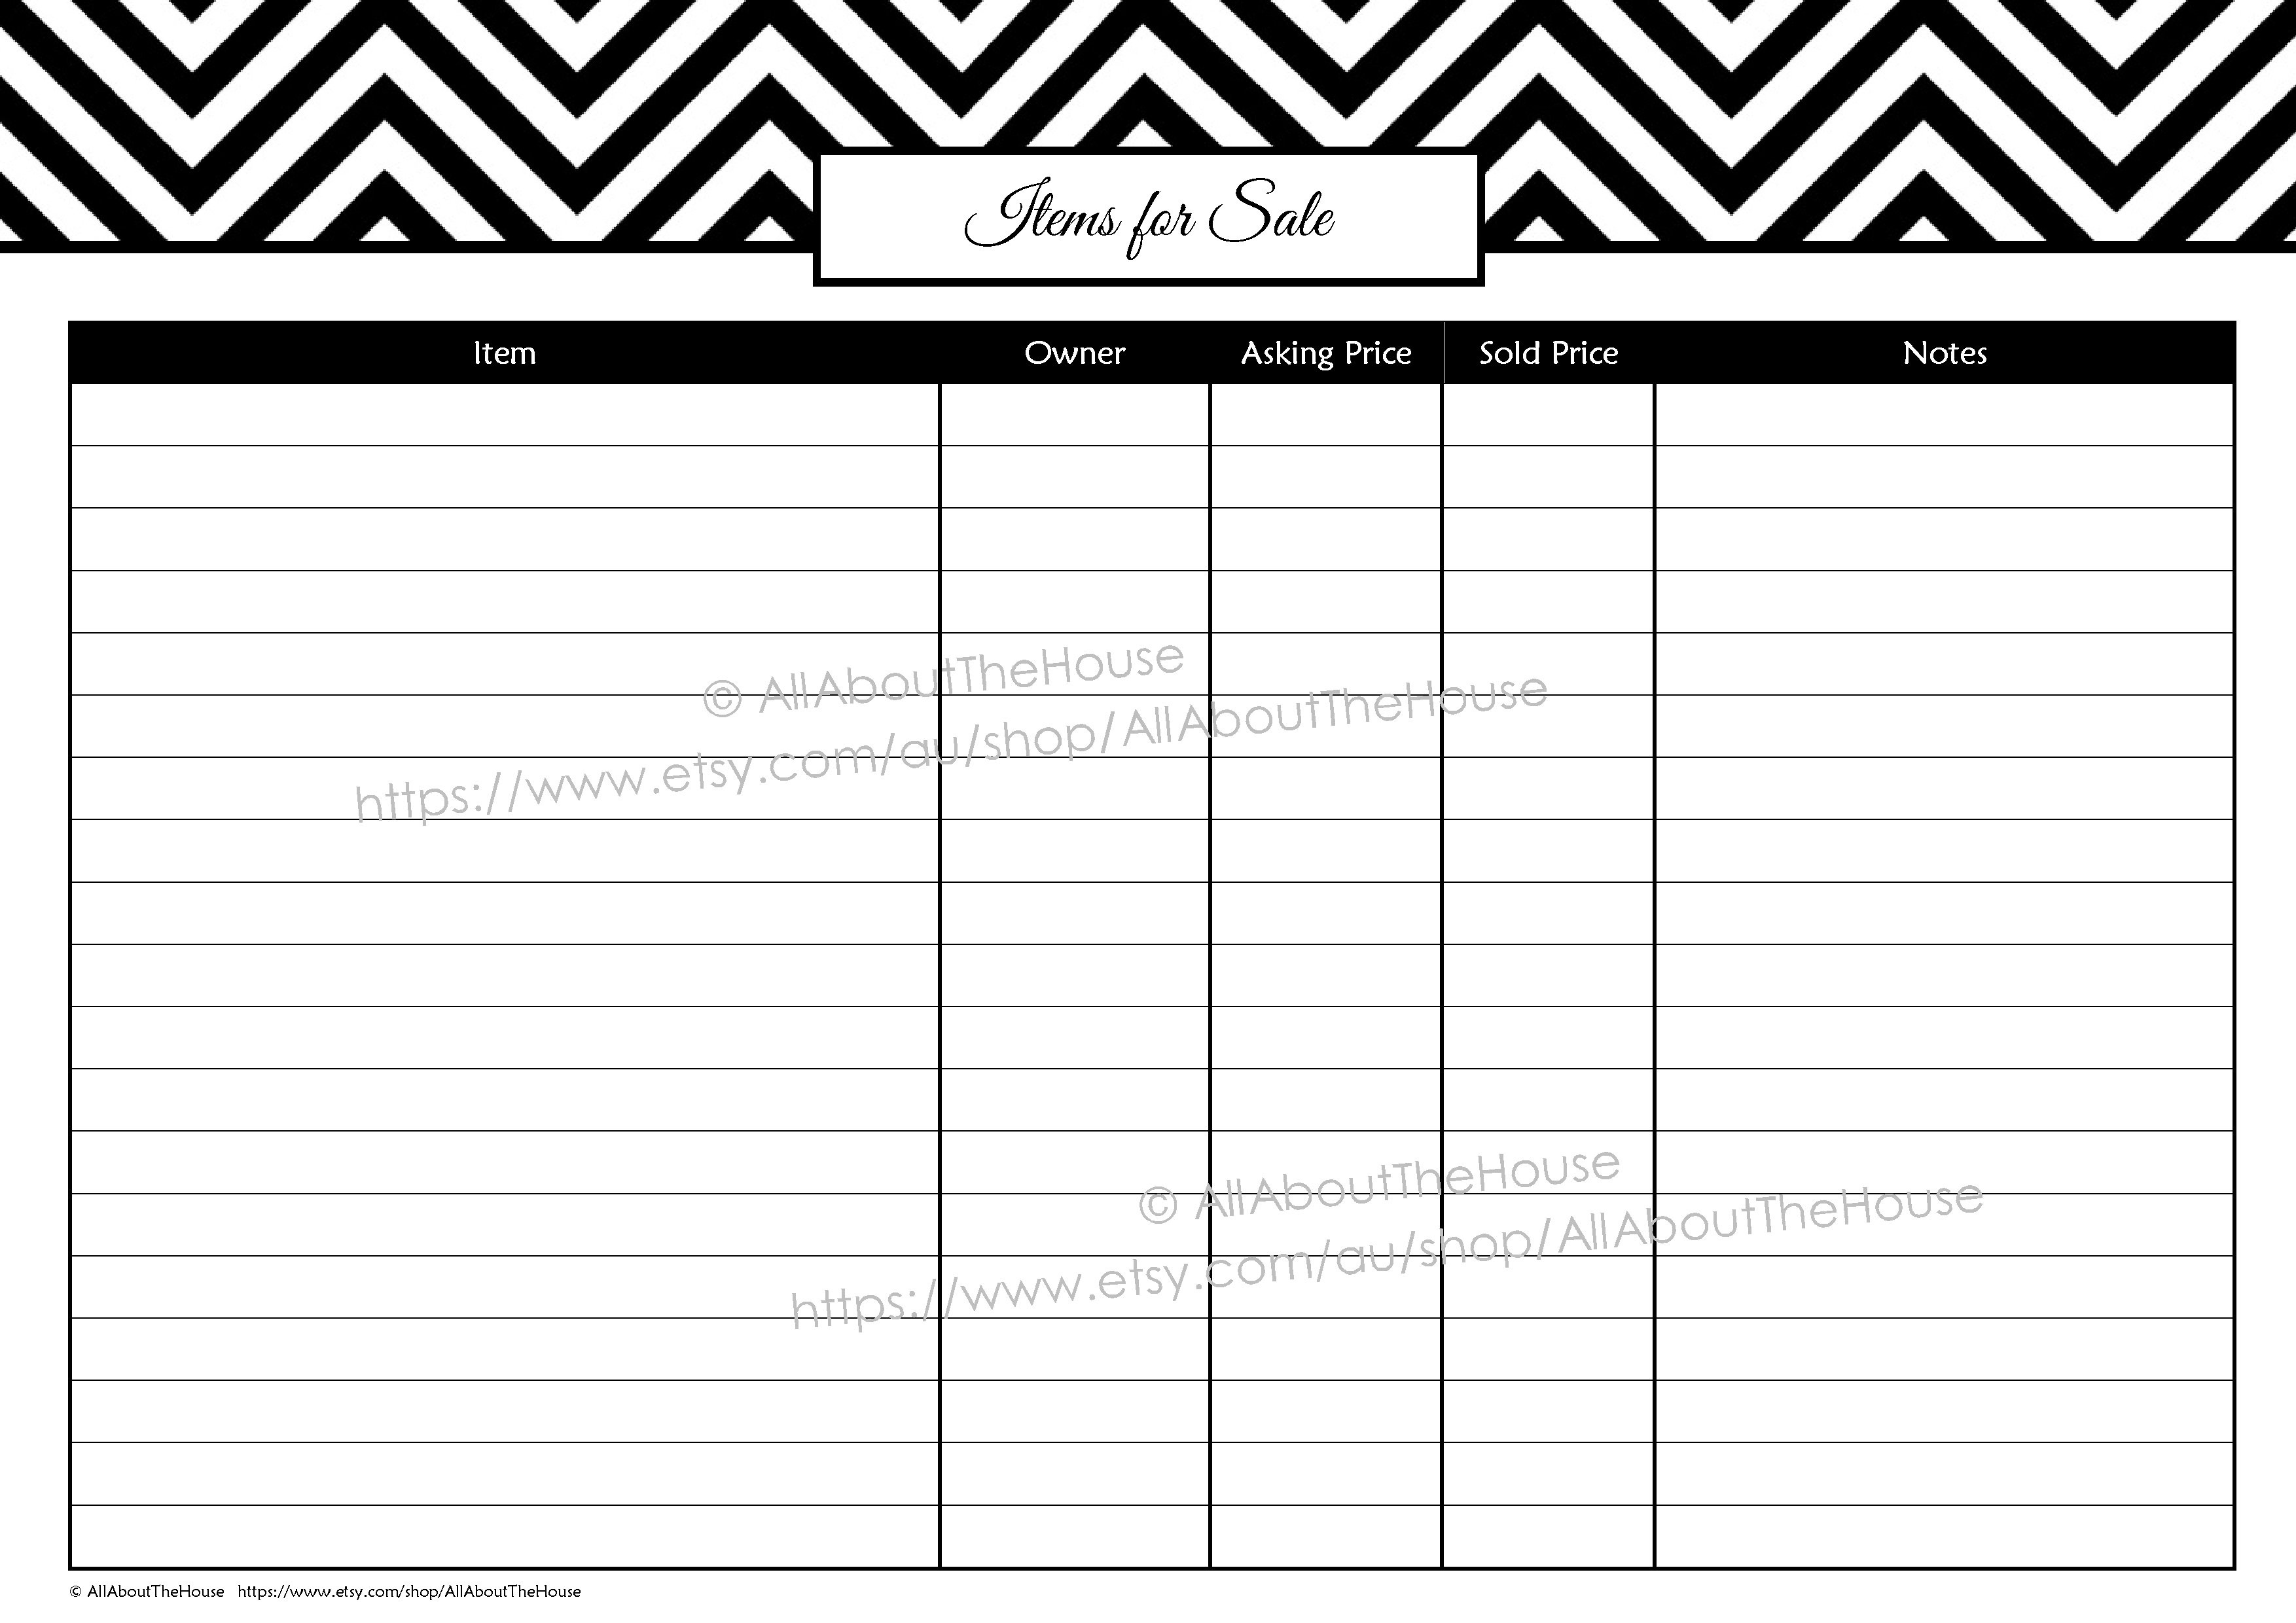 Garage Sale Planner | Allaboutthehouse Printables - Garage Sale Price Tags Free Printable